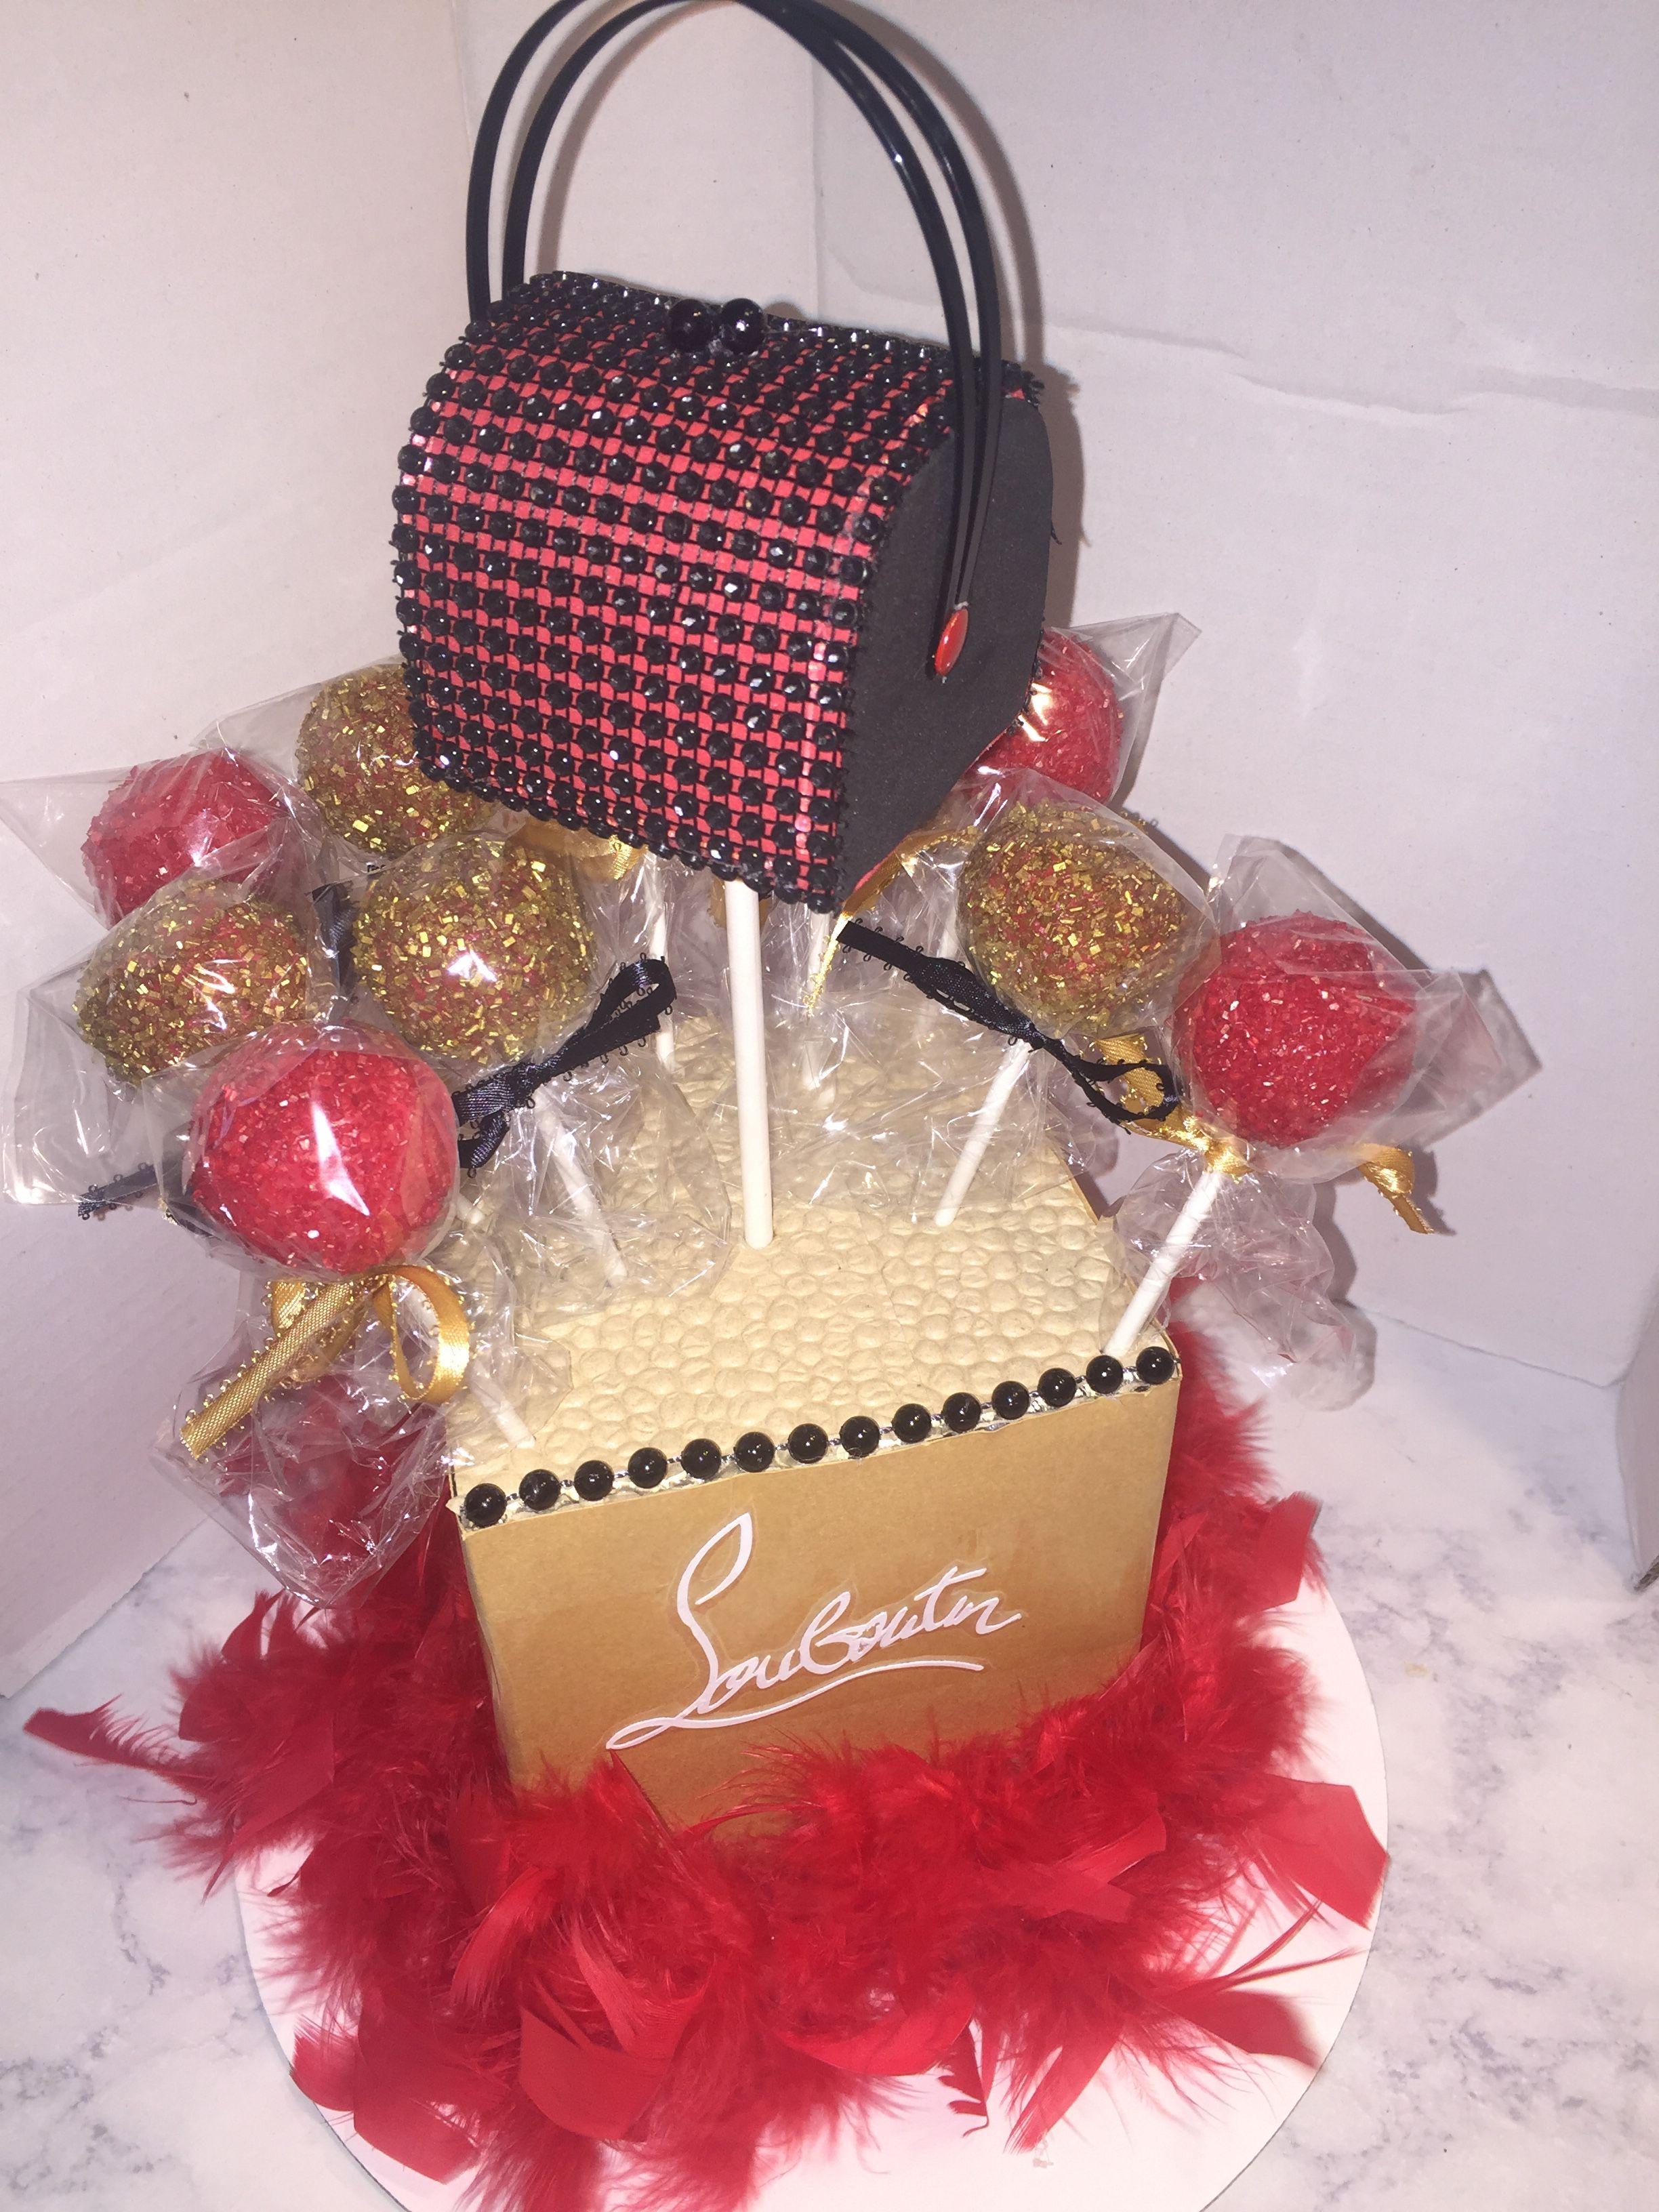 Christian louboutin themed cake pops bagspurse i made